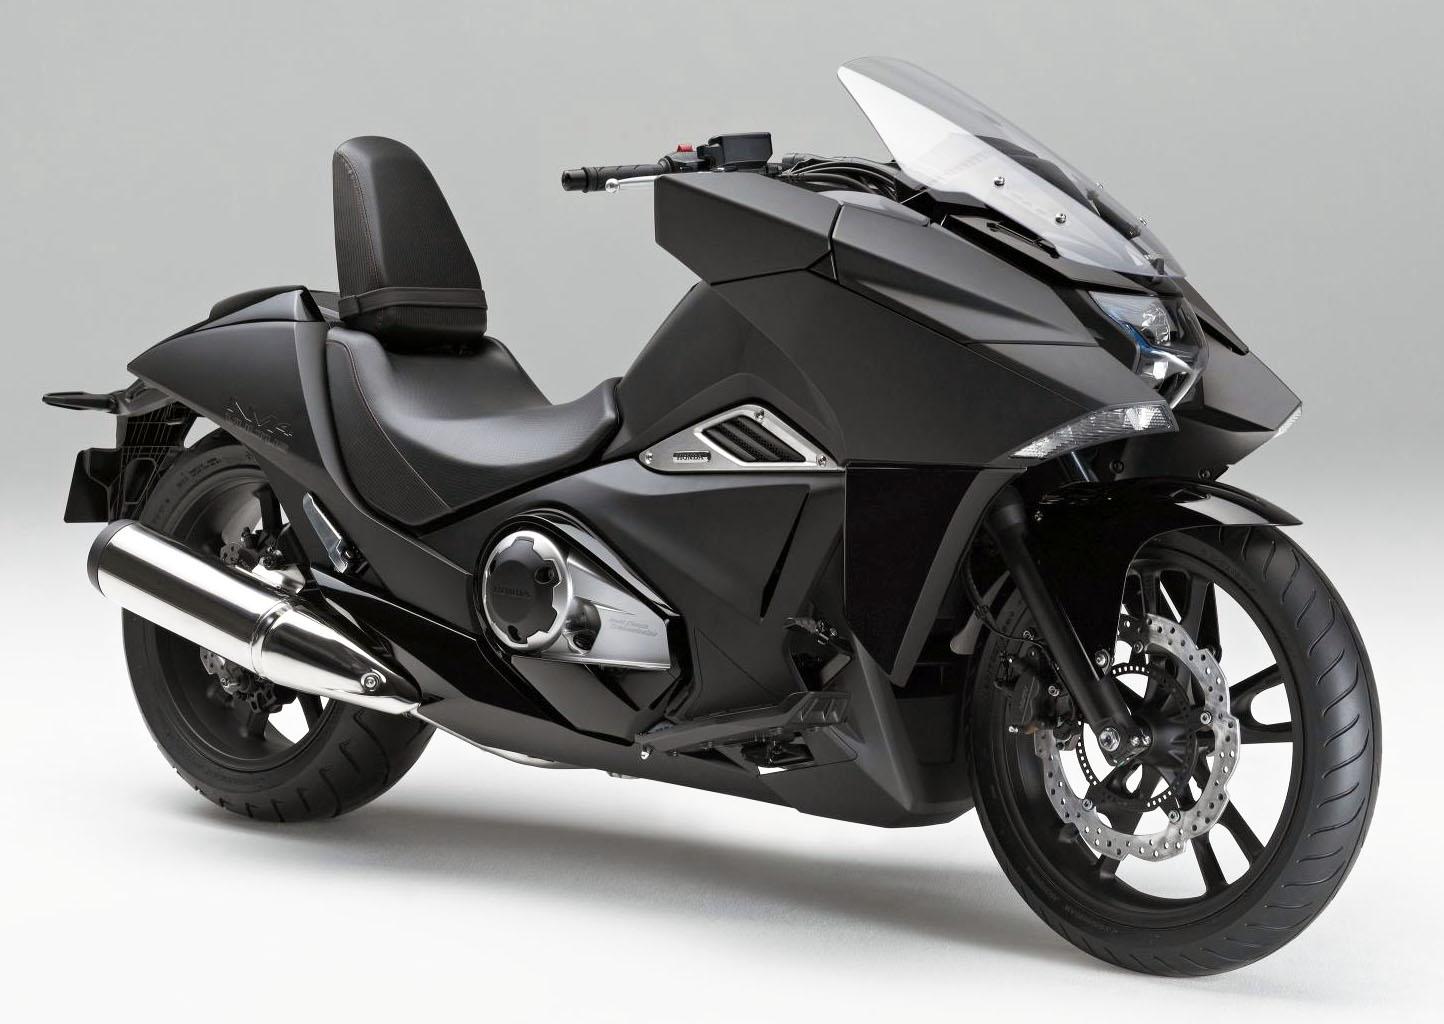 honda nm4 vultus a stealthy bike inspired by japanimation. Black Bedroom Furniture Sets. Home Design Ideas